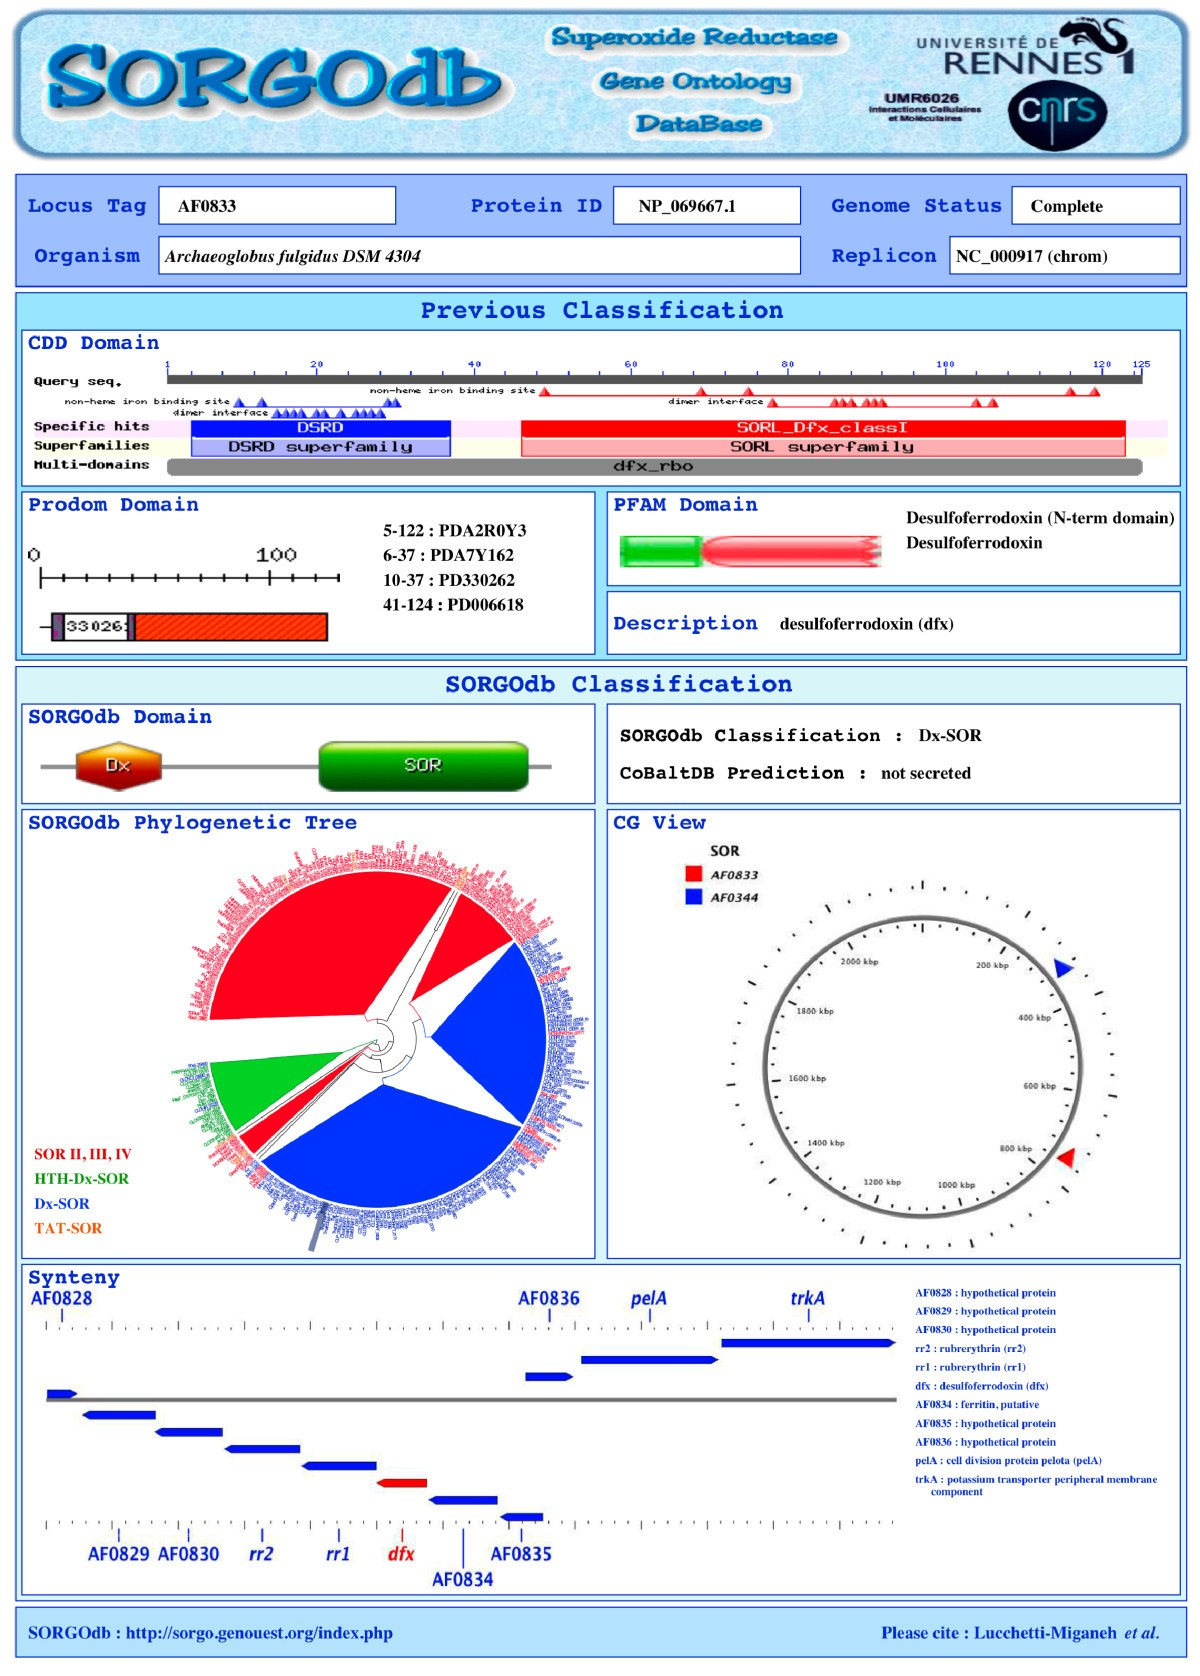 Sorgodb Superoxide Reductase Gene Ontology Curated Database Bmc Barton Python Mono Figure 2